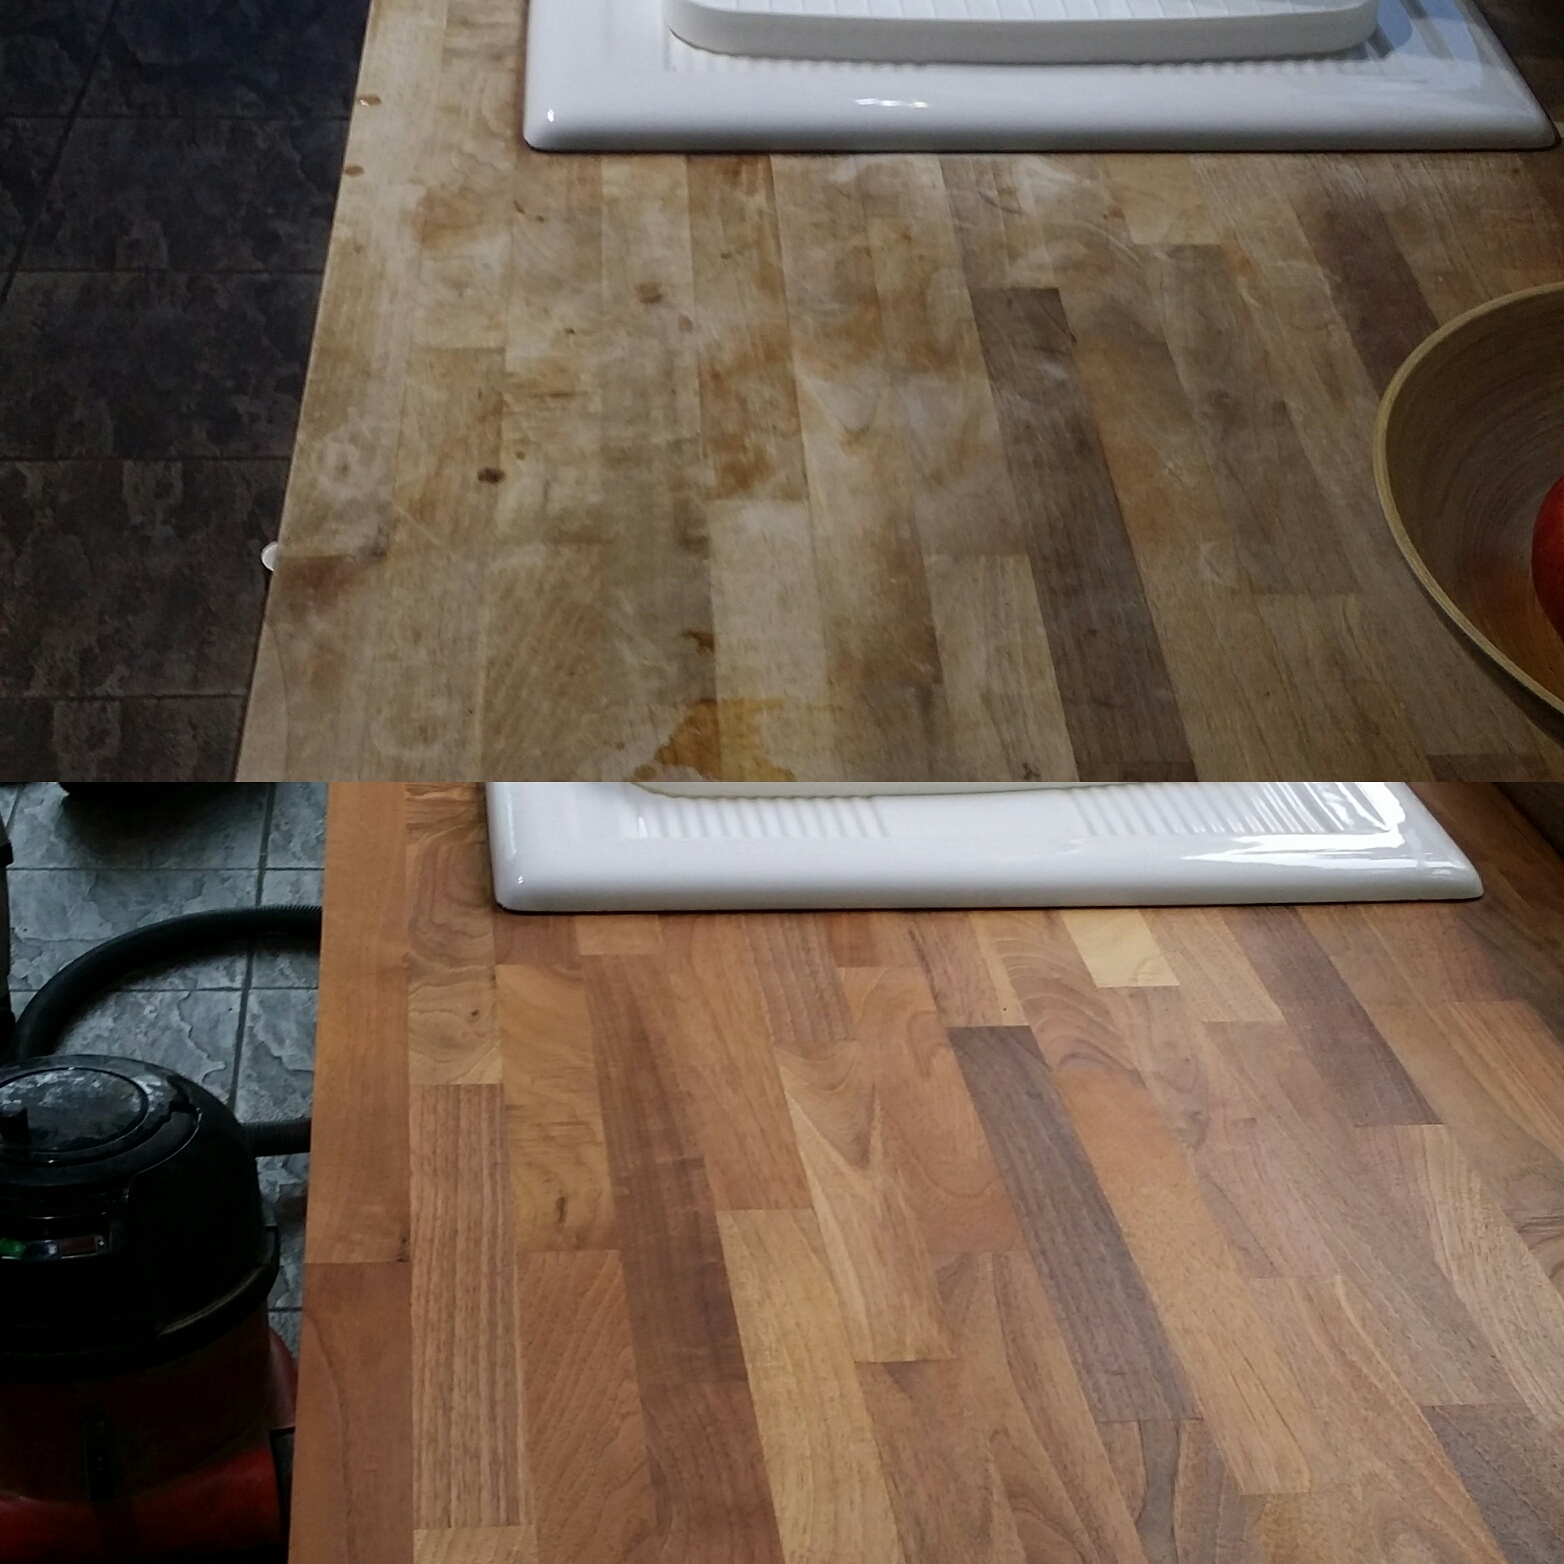 Kitchen Worktop Sanding and Refinishing